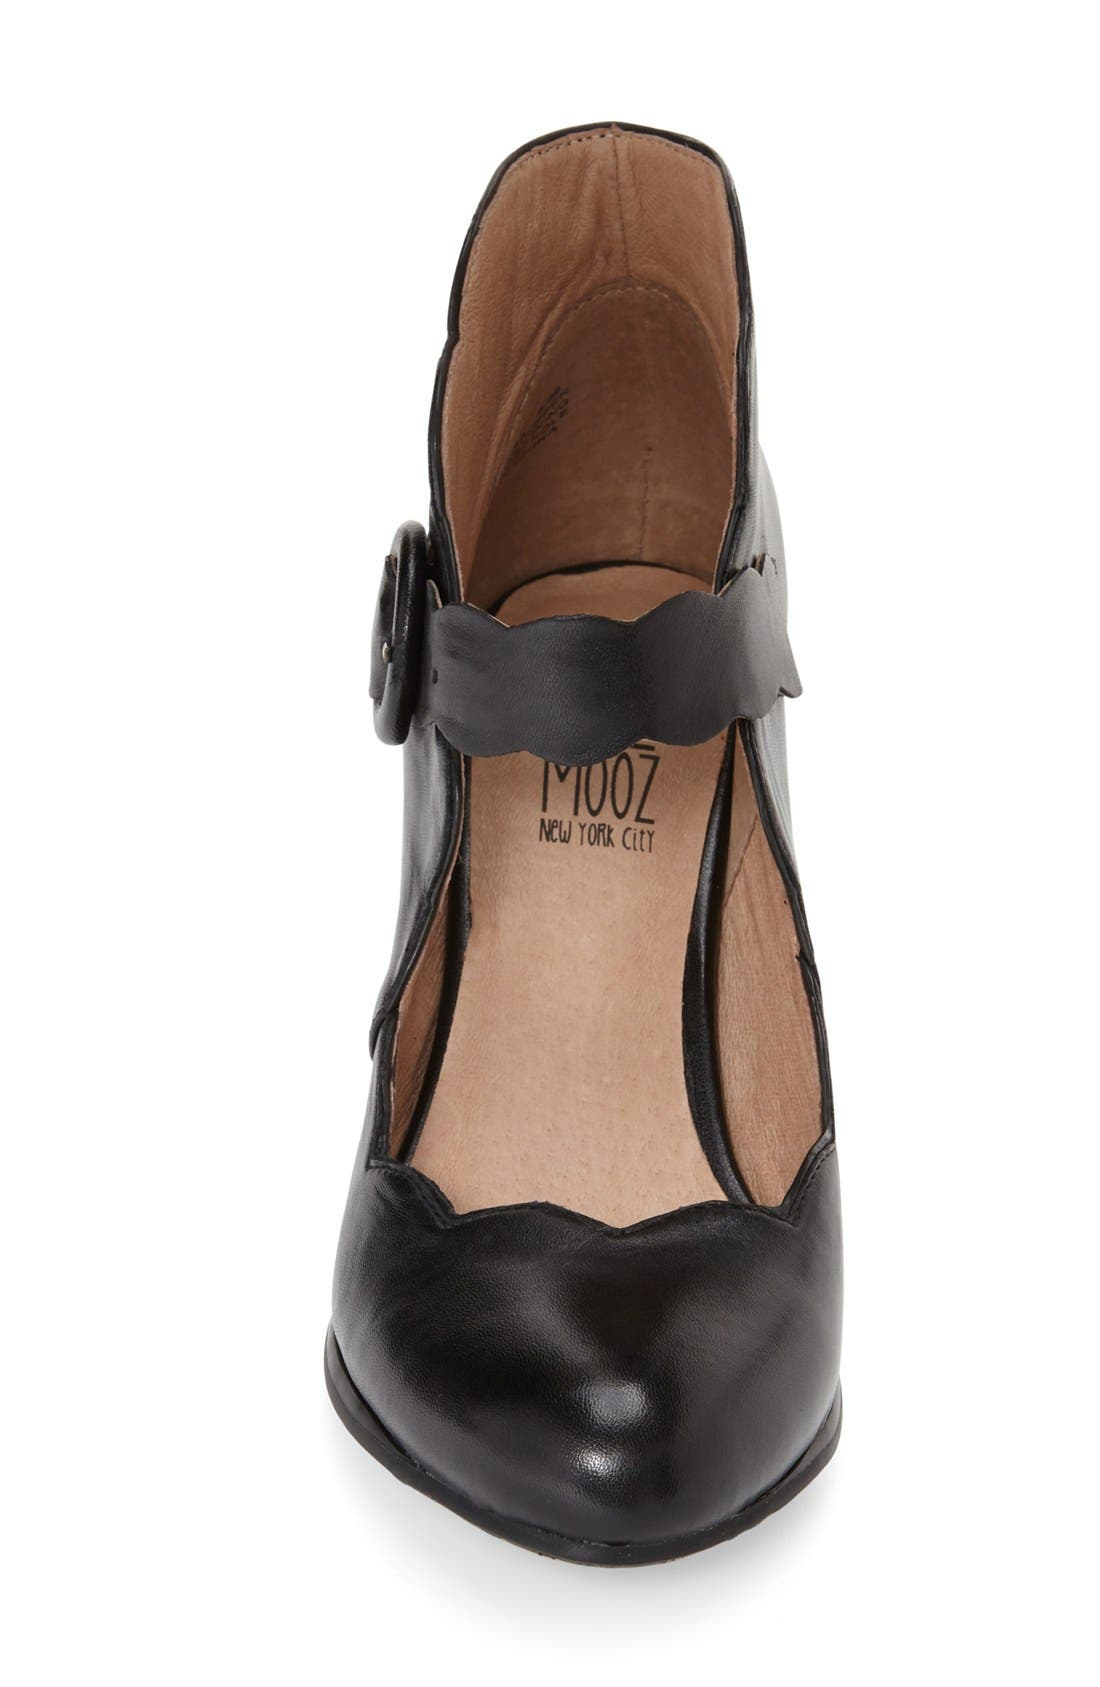 Footwear 'Carissa' Mary Jane Pump,                             Alternate thumbnail 3, color,                             001